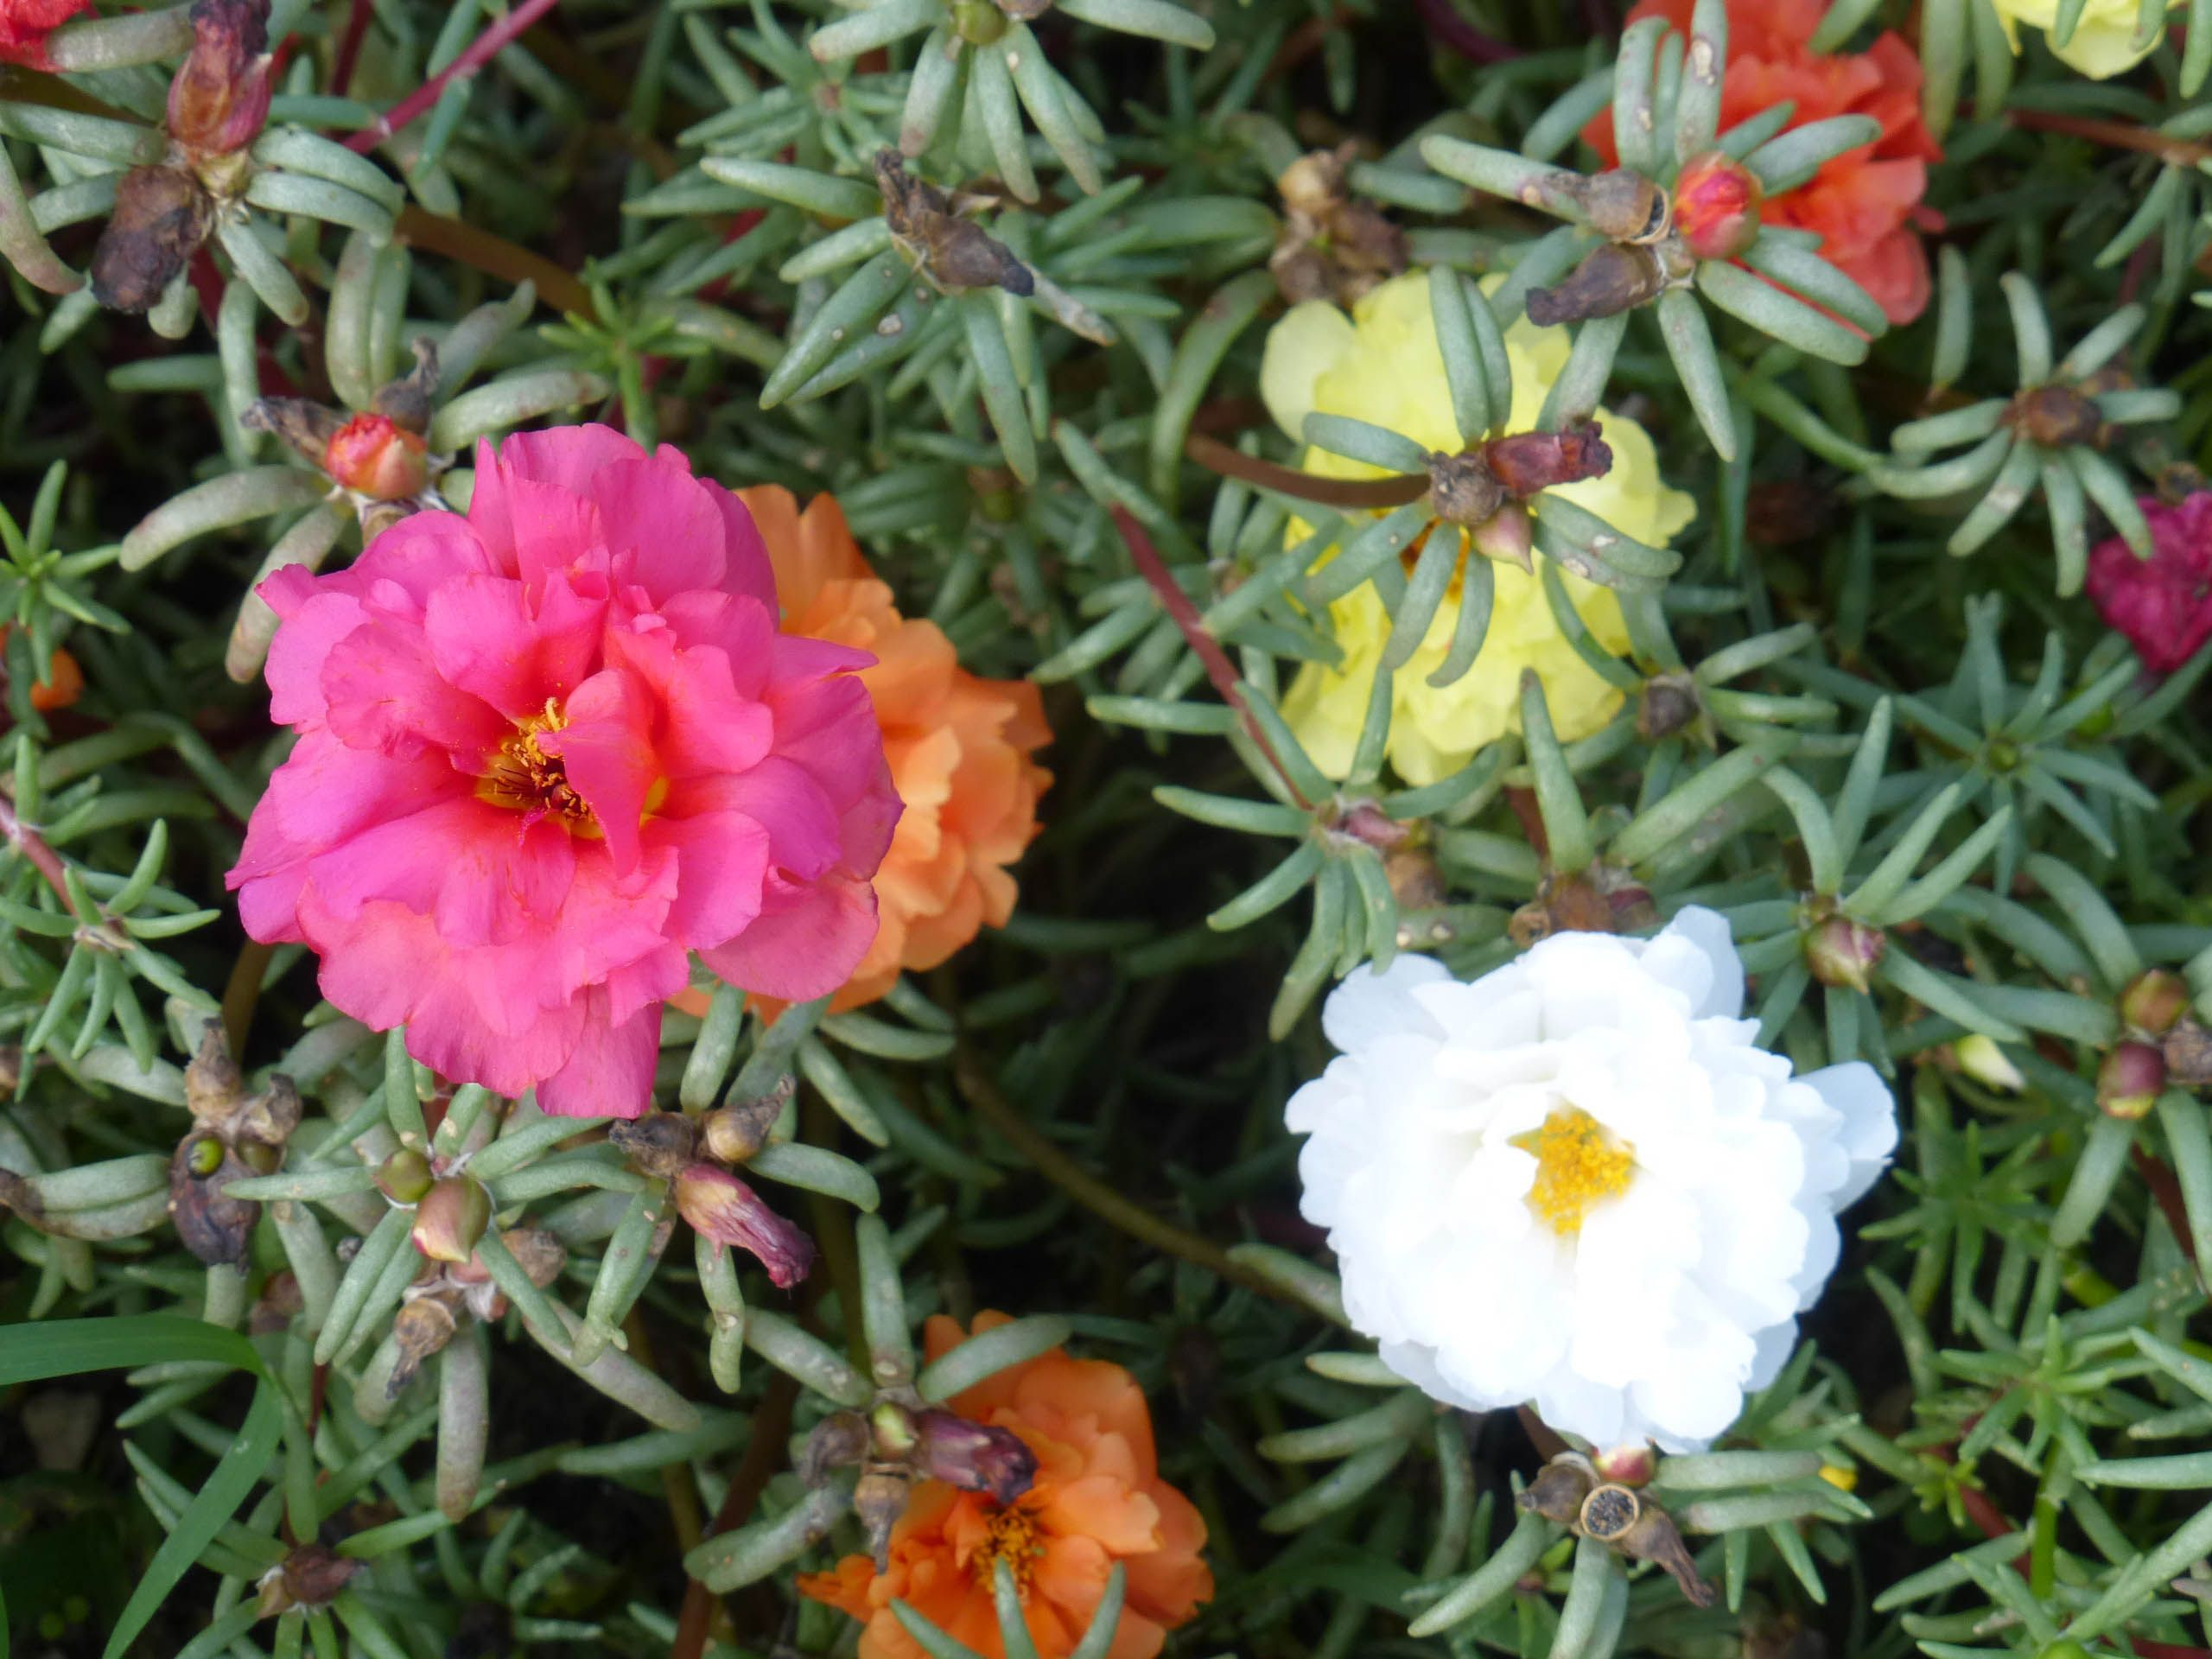 Portulaca Old Fashioned Moss Rose Portulaca Flowers Moss Portulaca Grandiflora